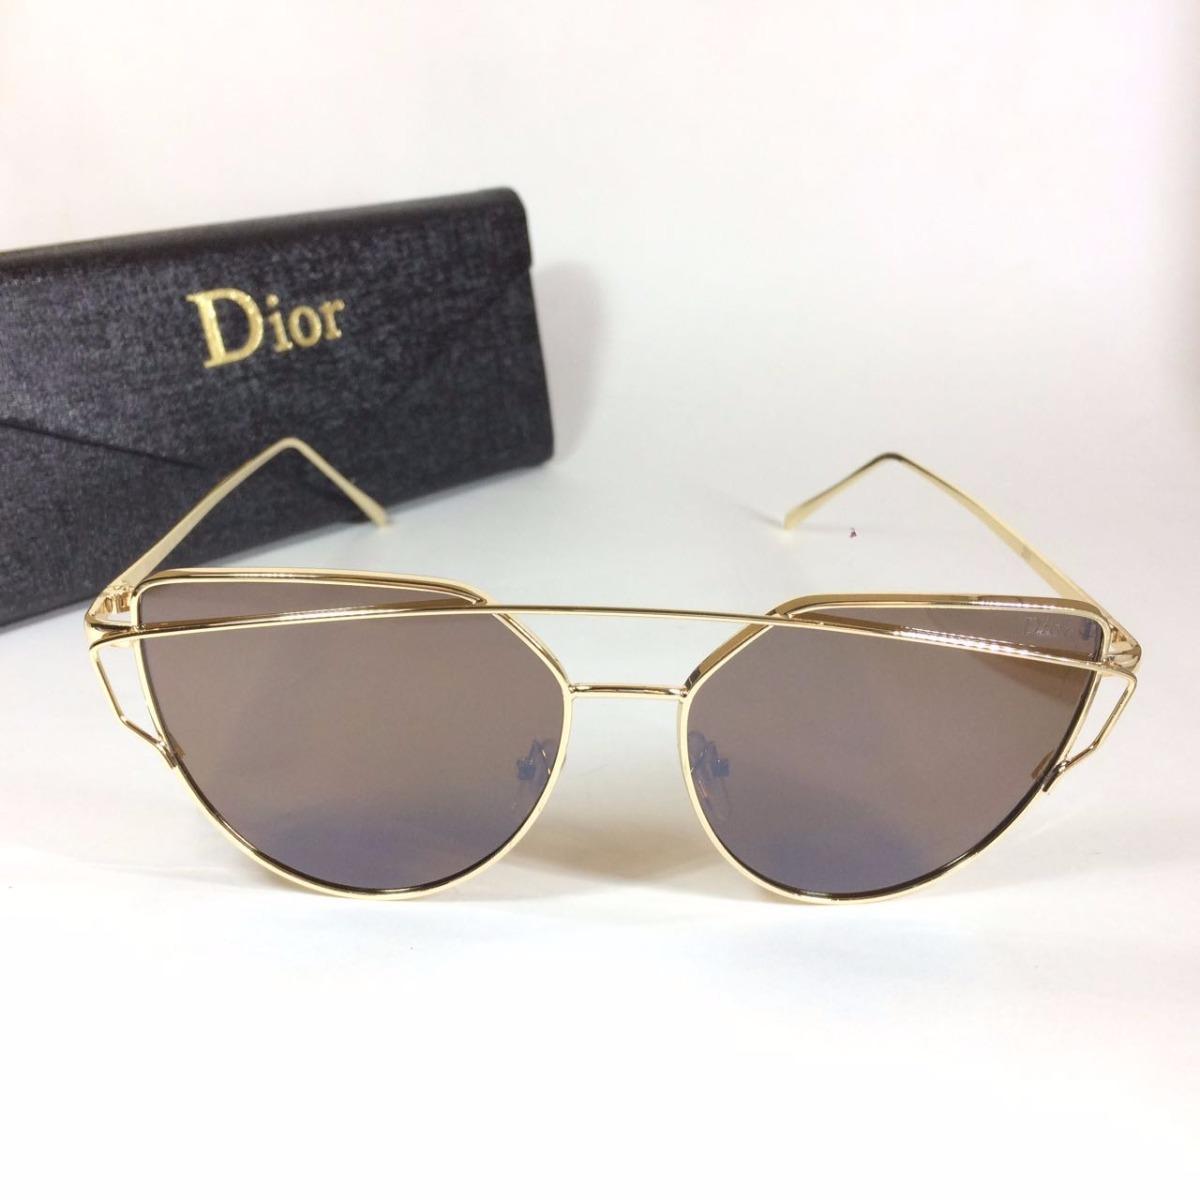 8d319692c0384 oculos sol feminino luxo dior reflected marrom pronta entreg. Carregando  zoom.